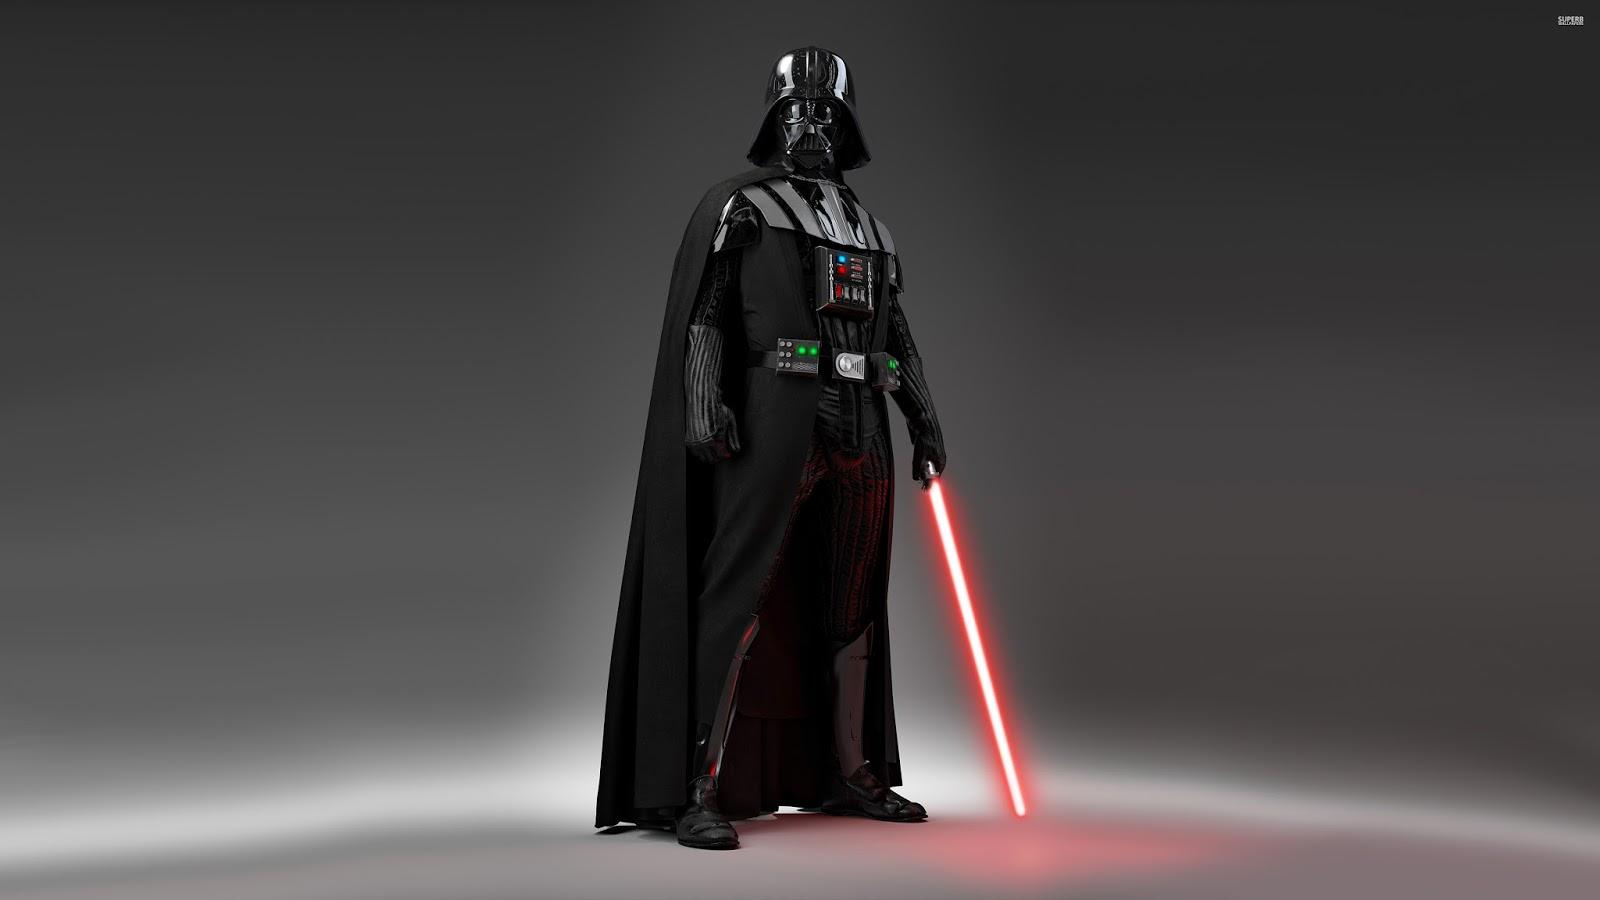 Star Wars Battlefront IPhone Wallpaper